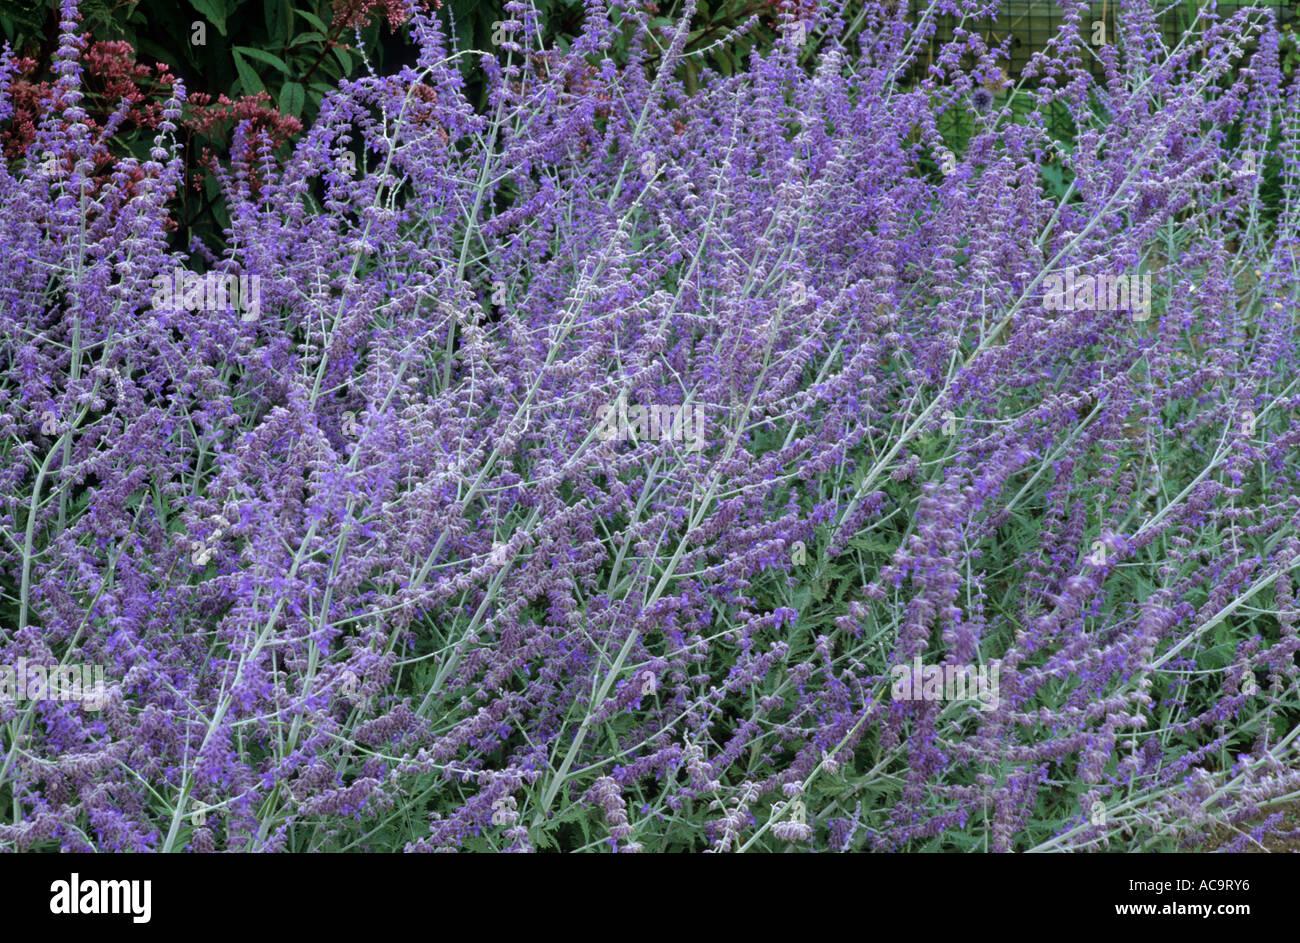 perovskia atriplicifolia 39 blue spire 39 russian sage. Black Bedroom Furniture Sets. Home Design Ideas